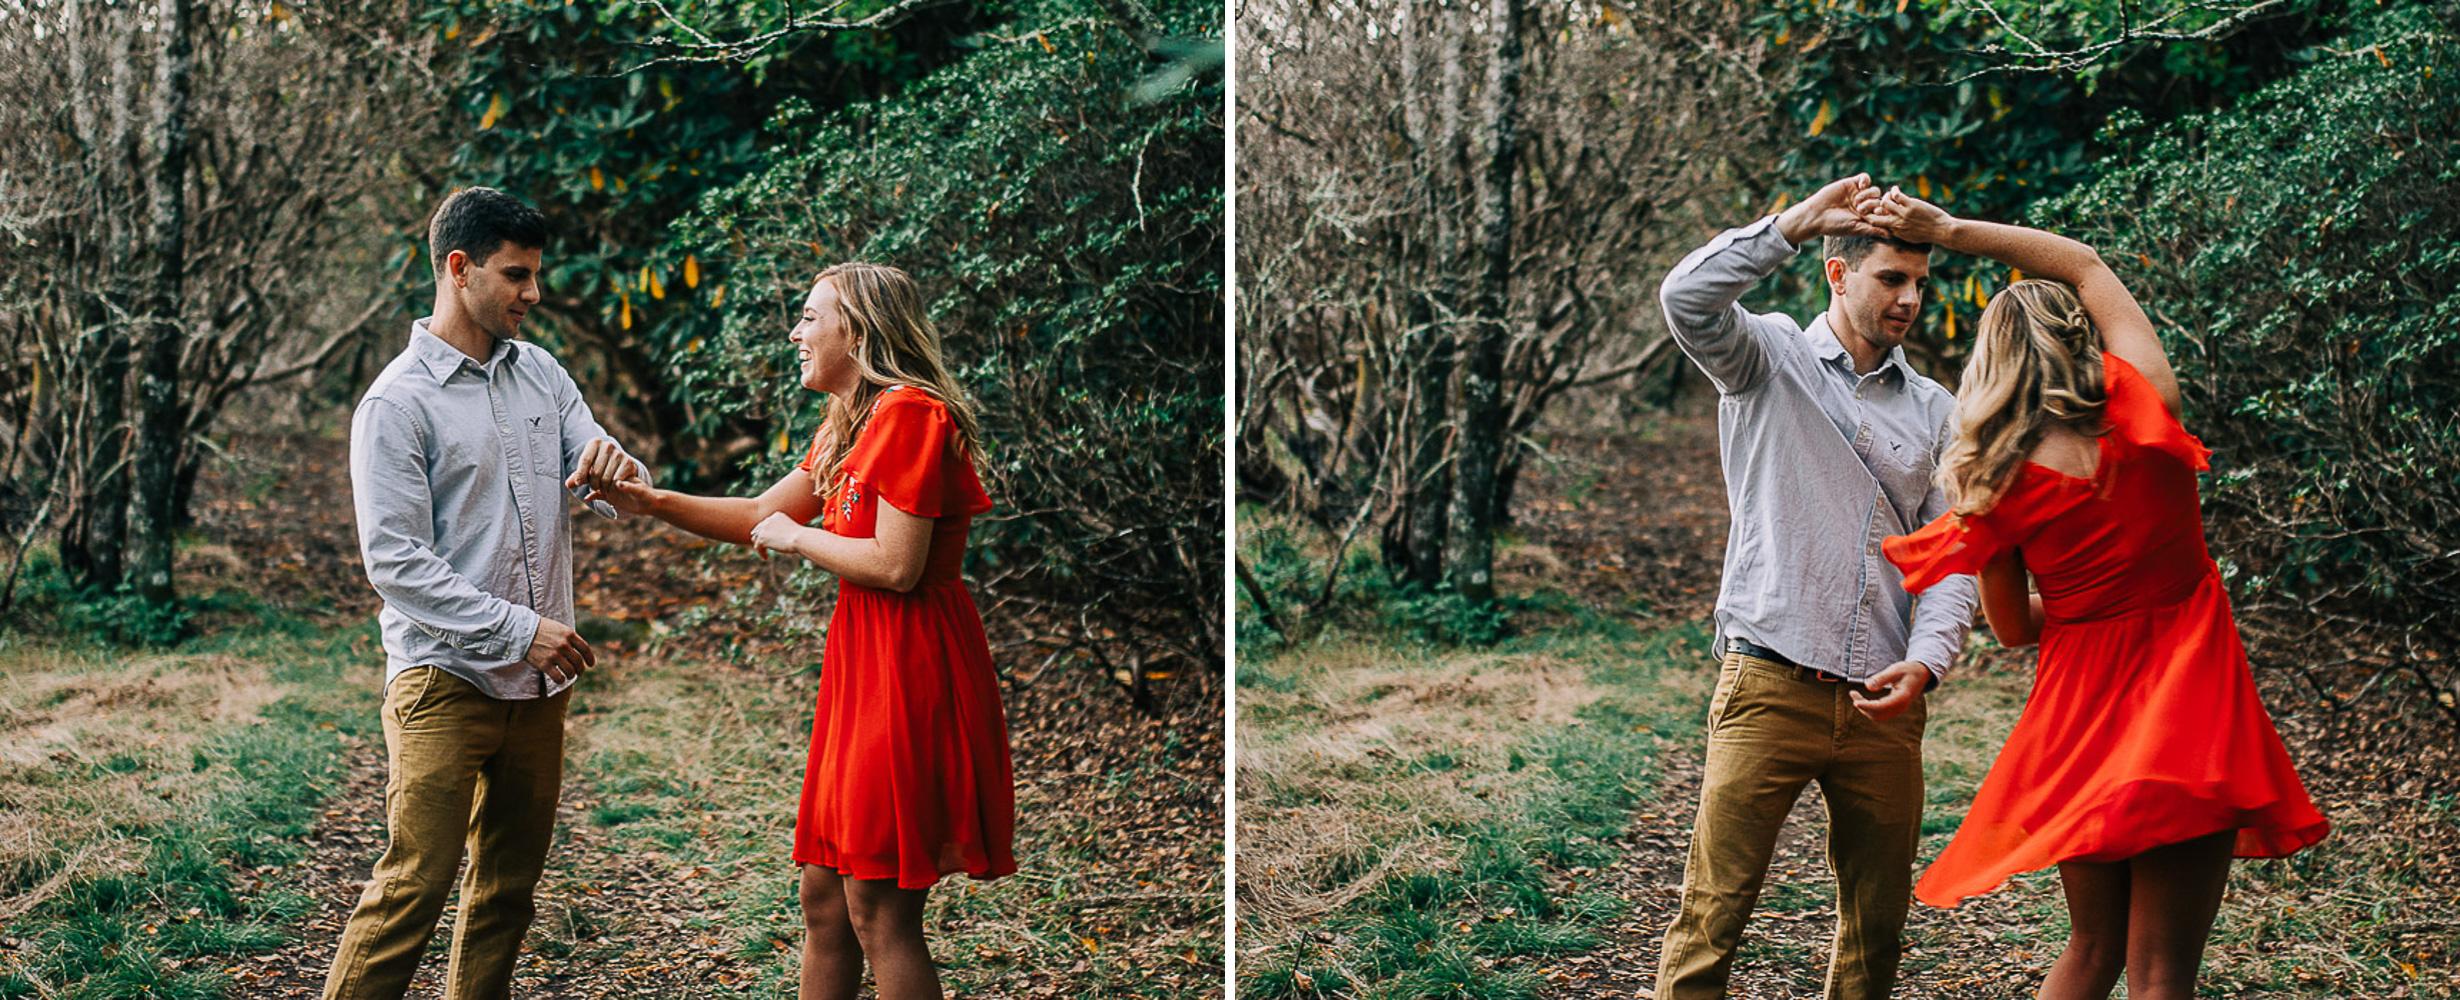 Engagement Portraits 29.jpg